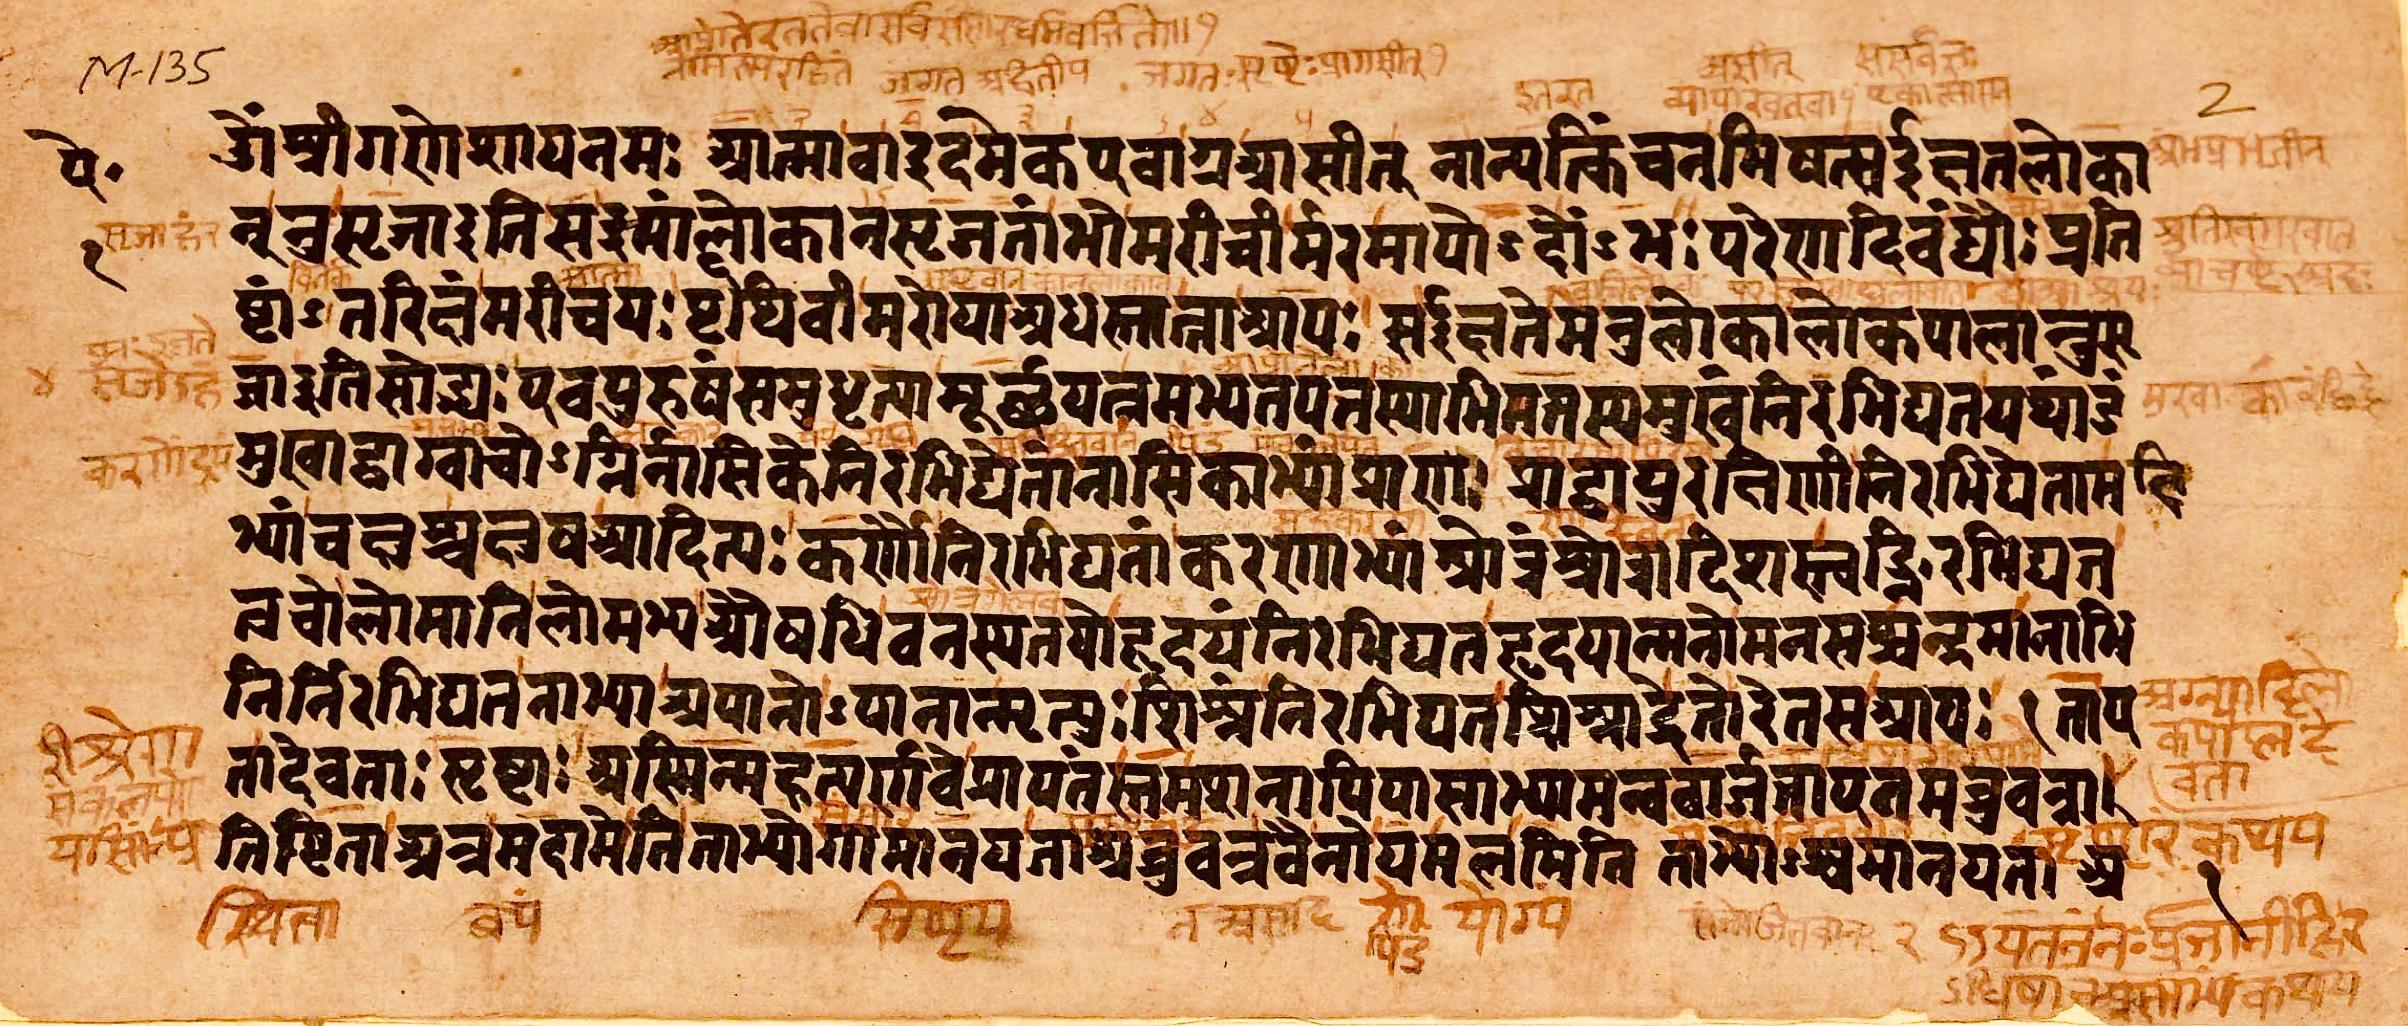 Sanskrit Of The Vedas Vs Modern Sanskrit: File:Aitareya Upanishad, Sanskrit, Rigveda, Devanagari